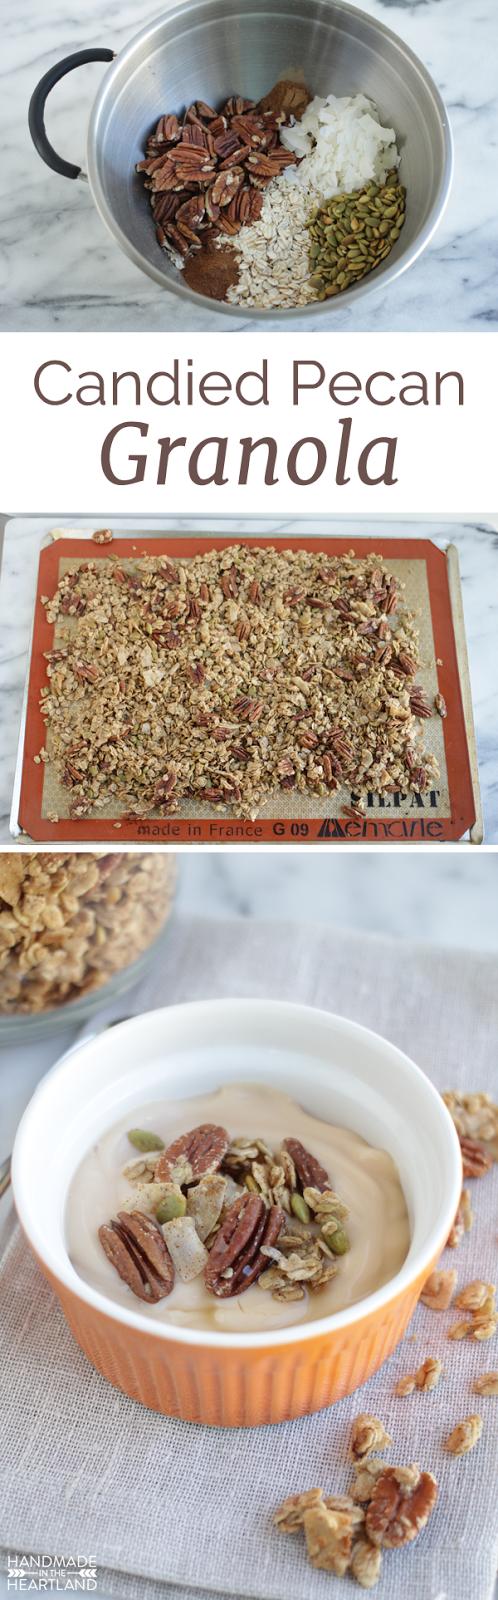 Candied Pecan Granola with Pumpkin Pie Yogurt